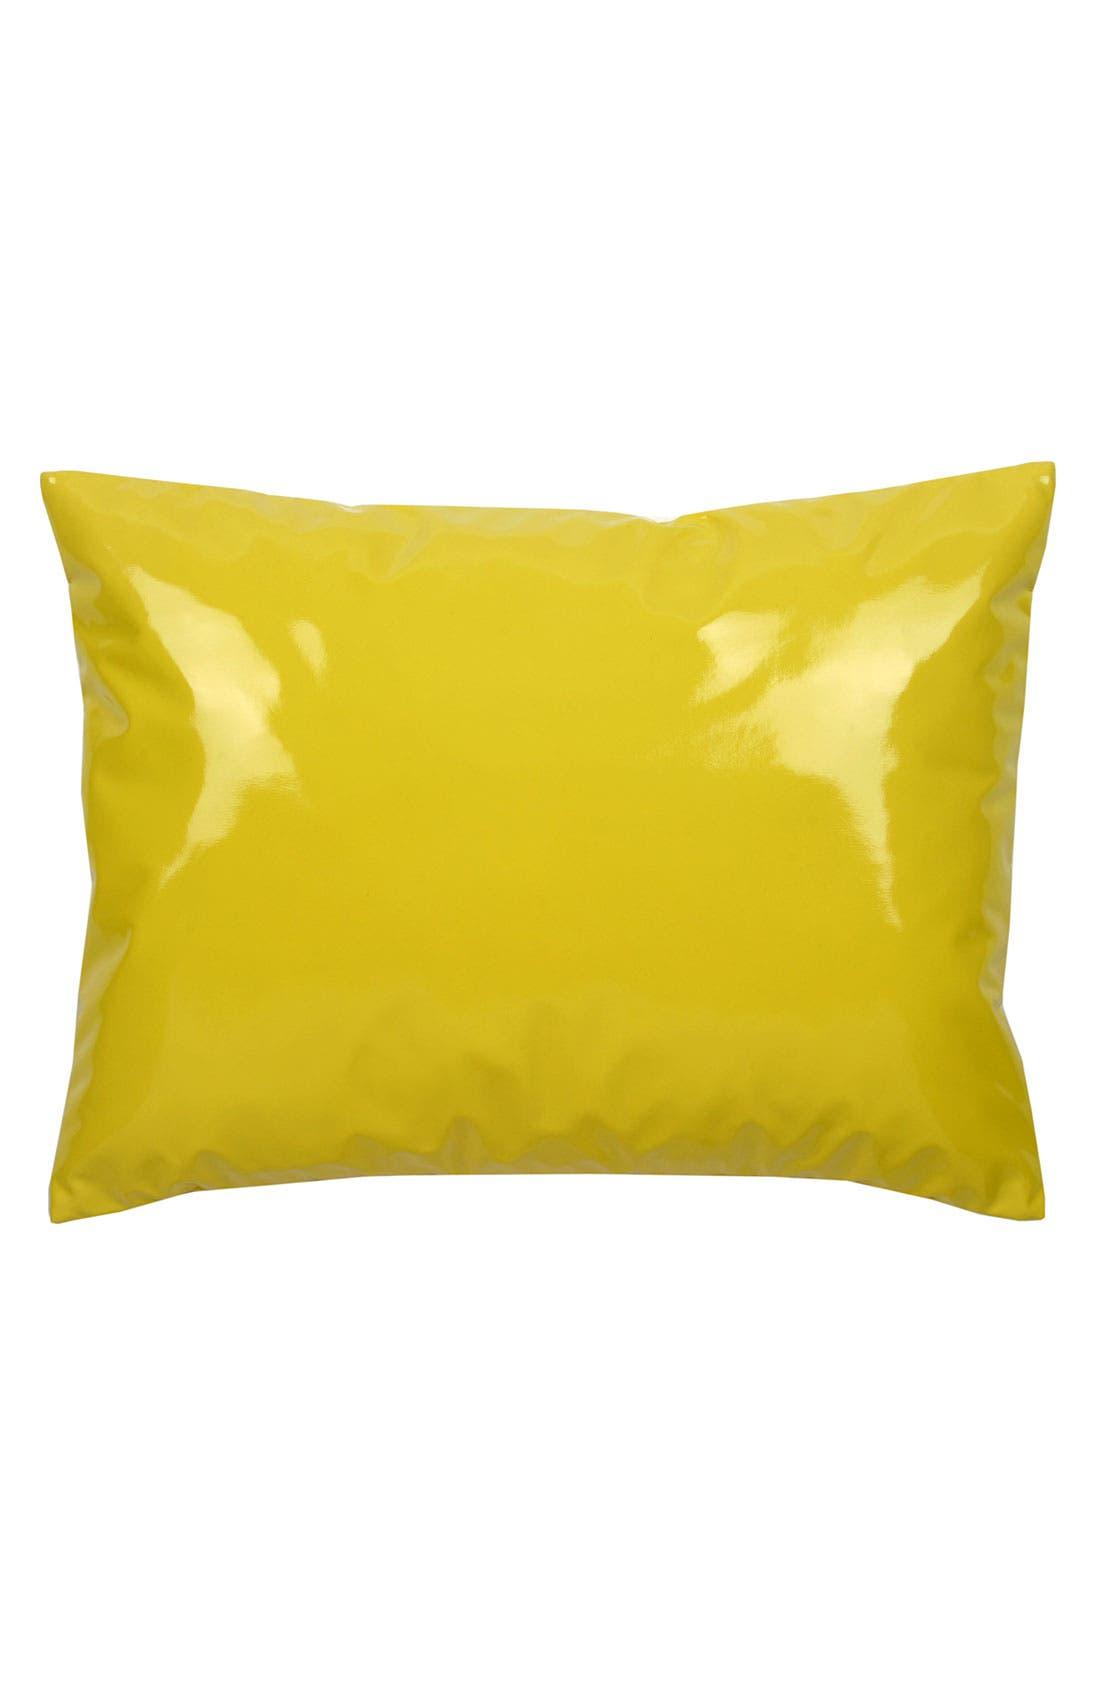 Alternate Image 1 Selected - Blissliving Home 'Empire' Pillow